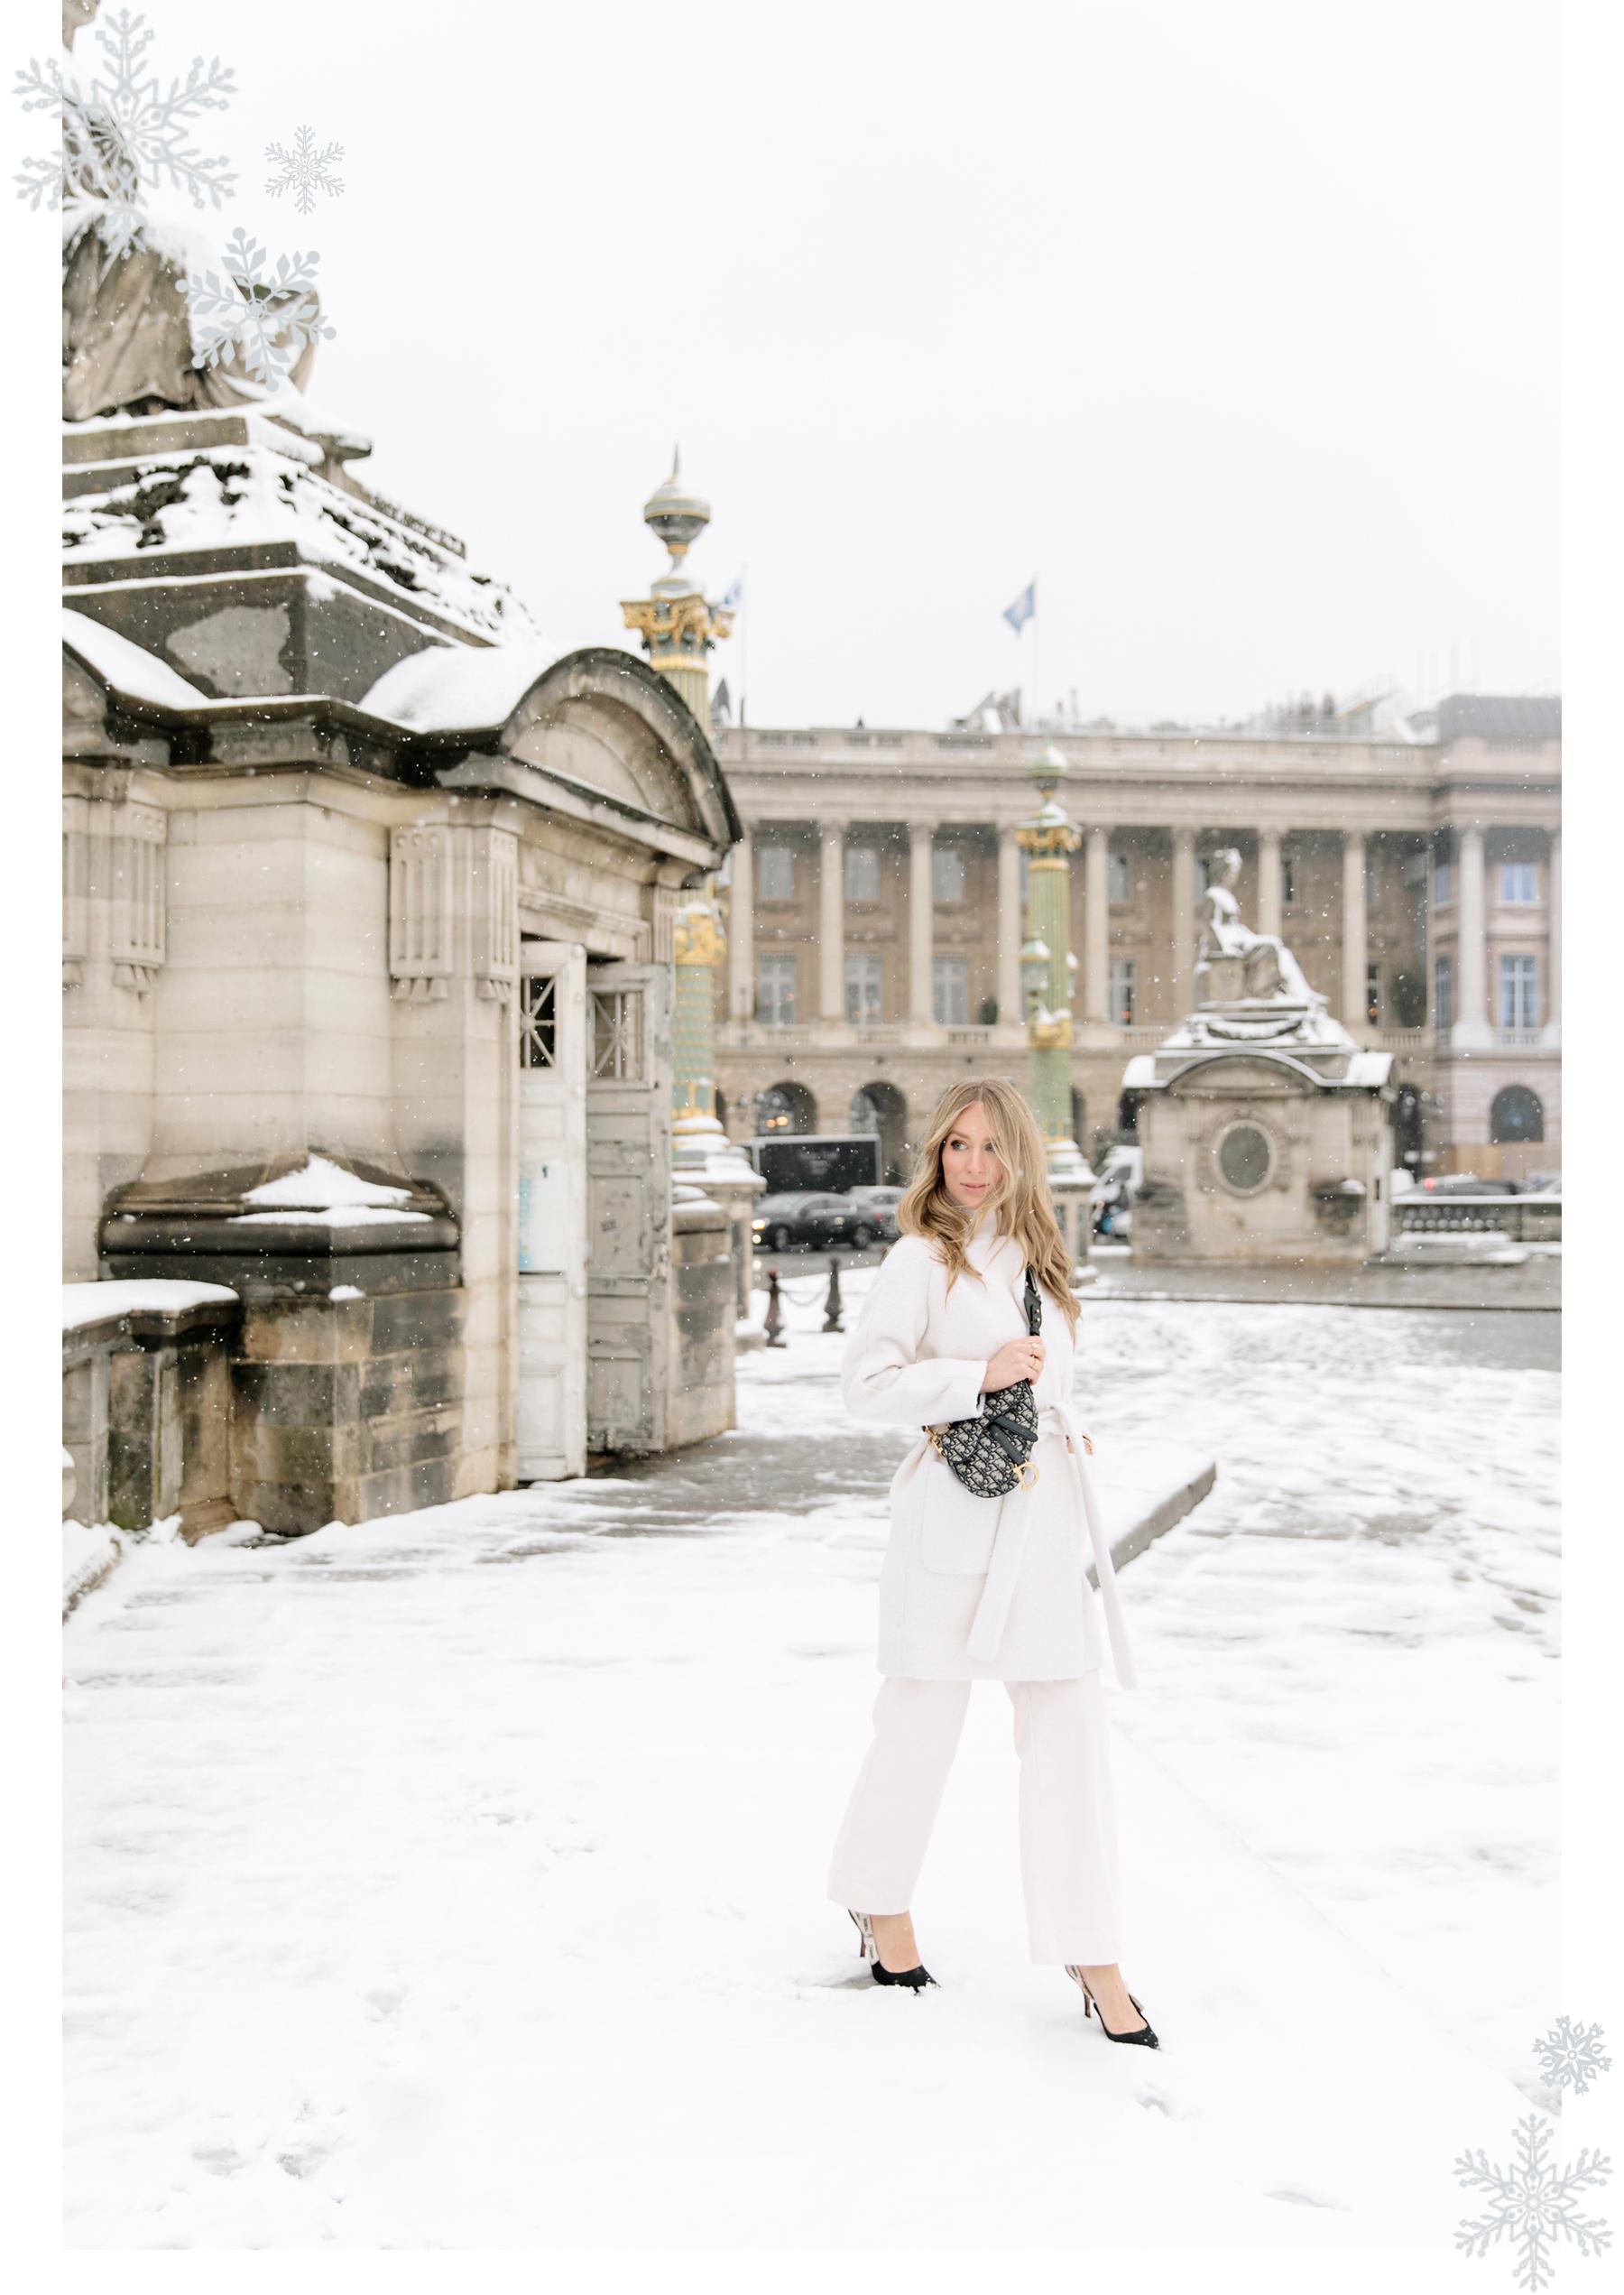 Carin_Olsson_Winter_Paris.jpg